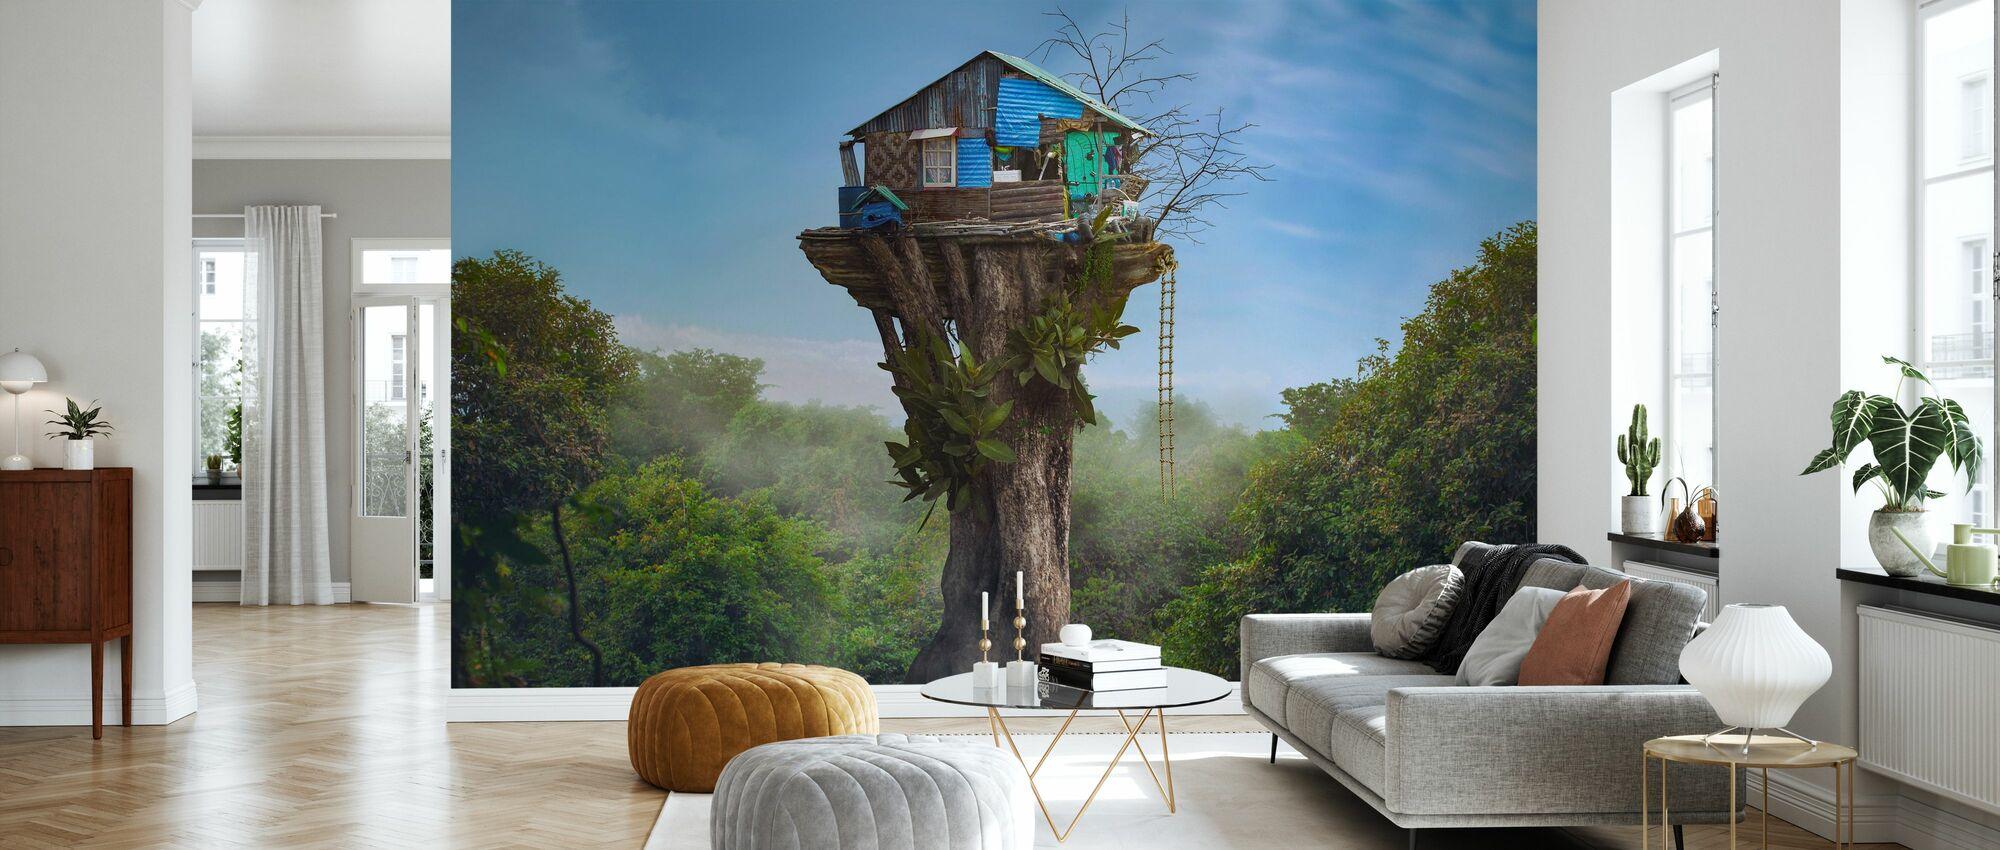 House in the Sky - Wallpaper - Living Room